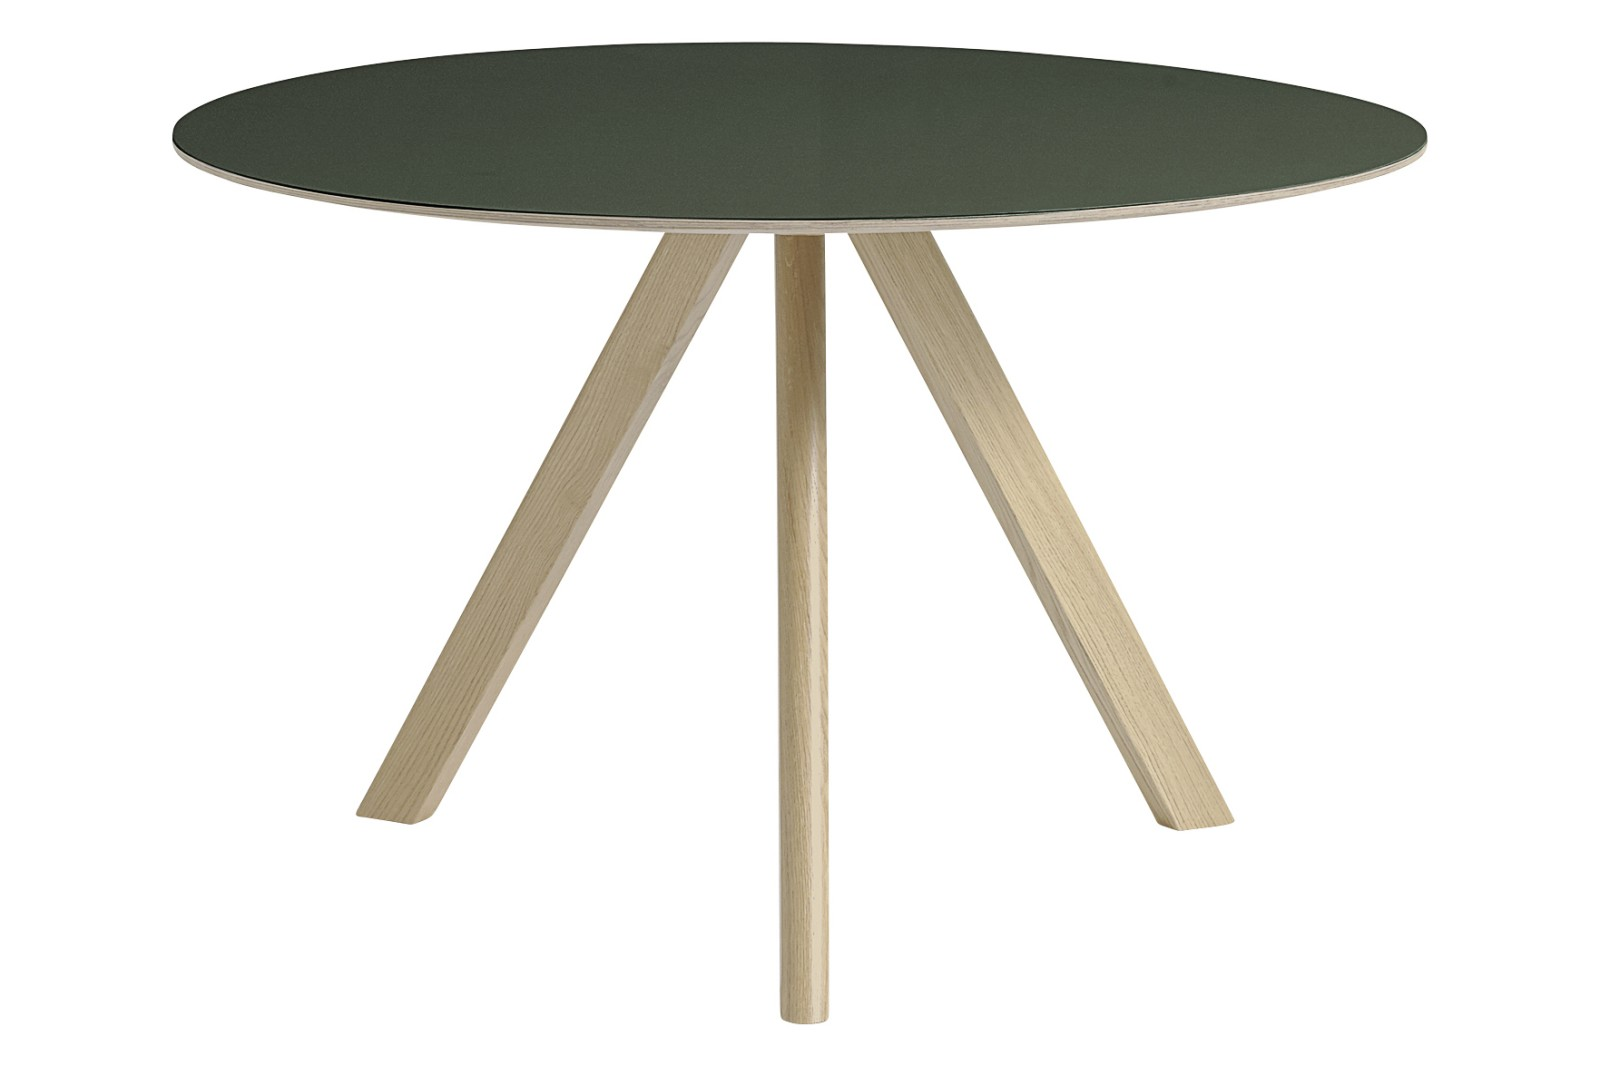 Copenhague Linoleum Top Round Dining Table CPH20 Matt Lacquered Solid Oak Base, Green Linoleum Top,